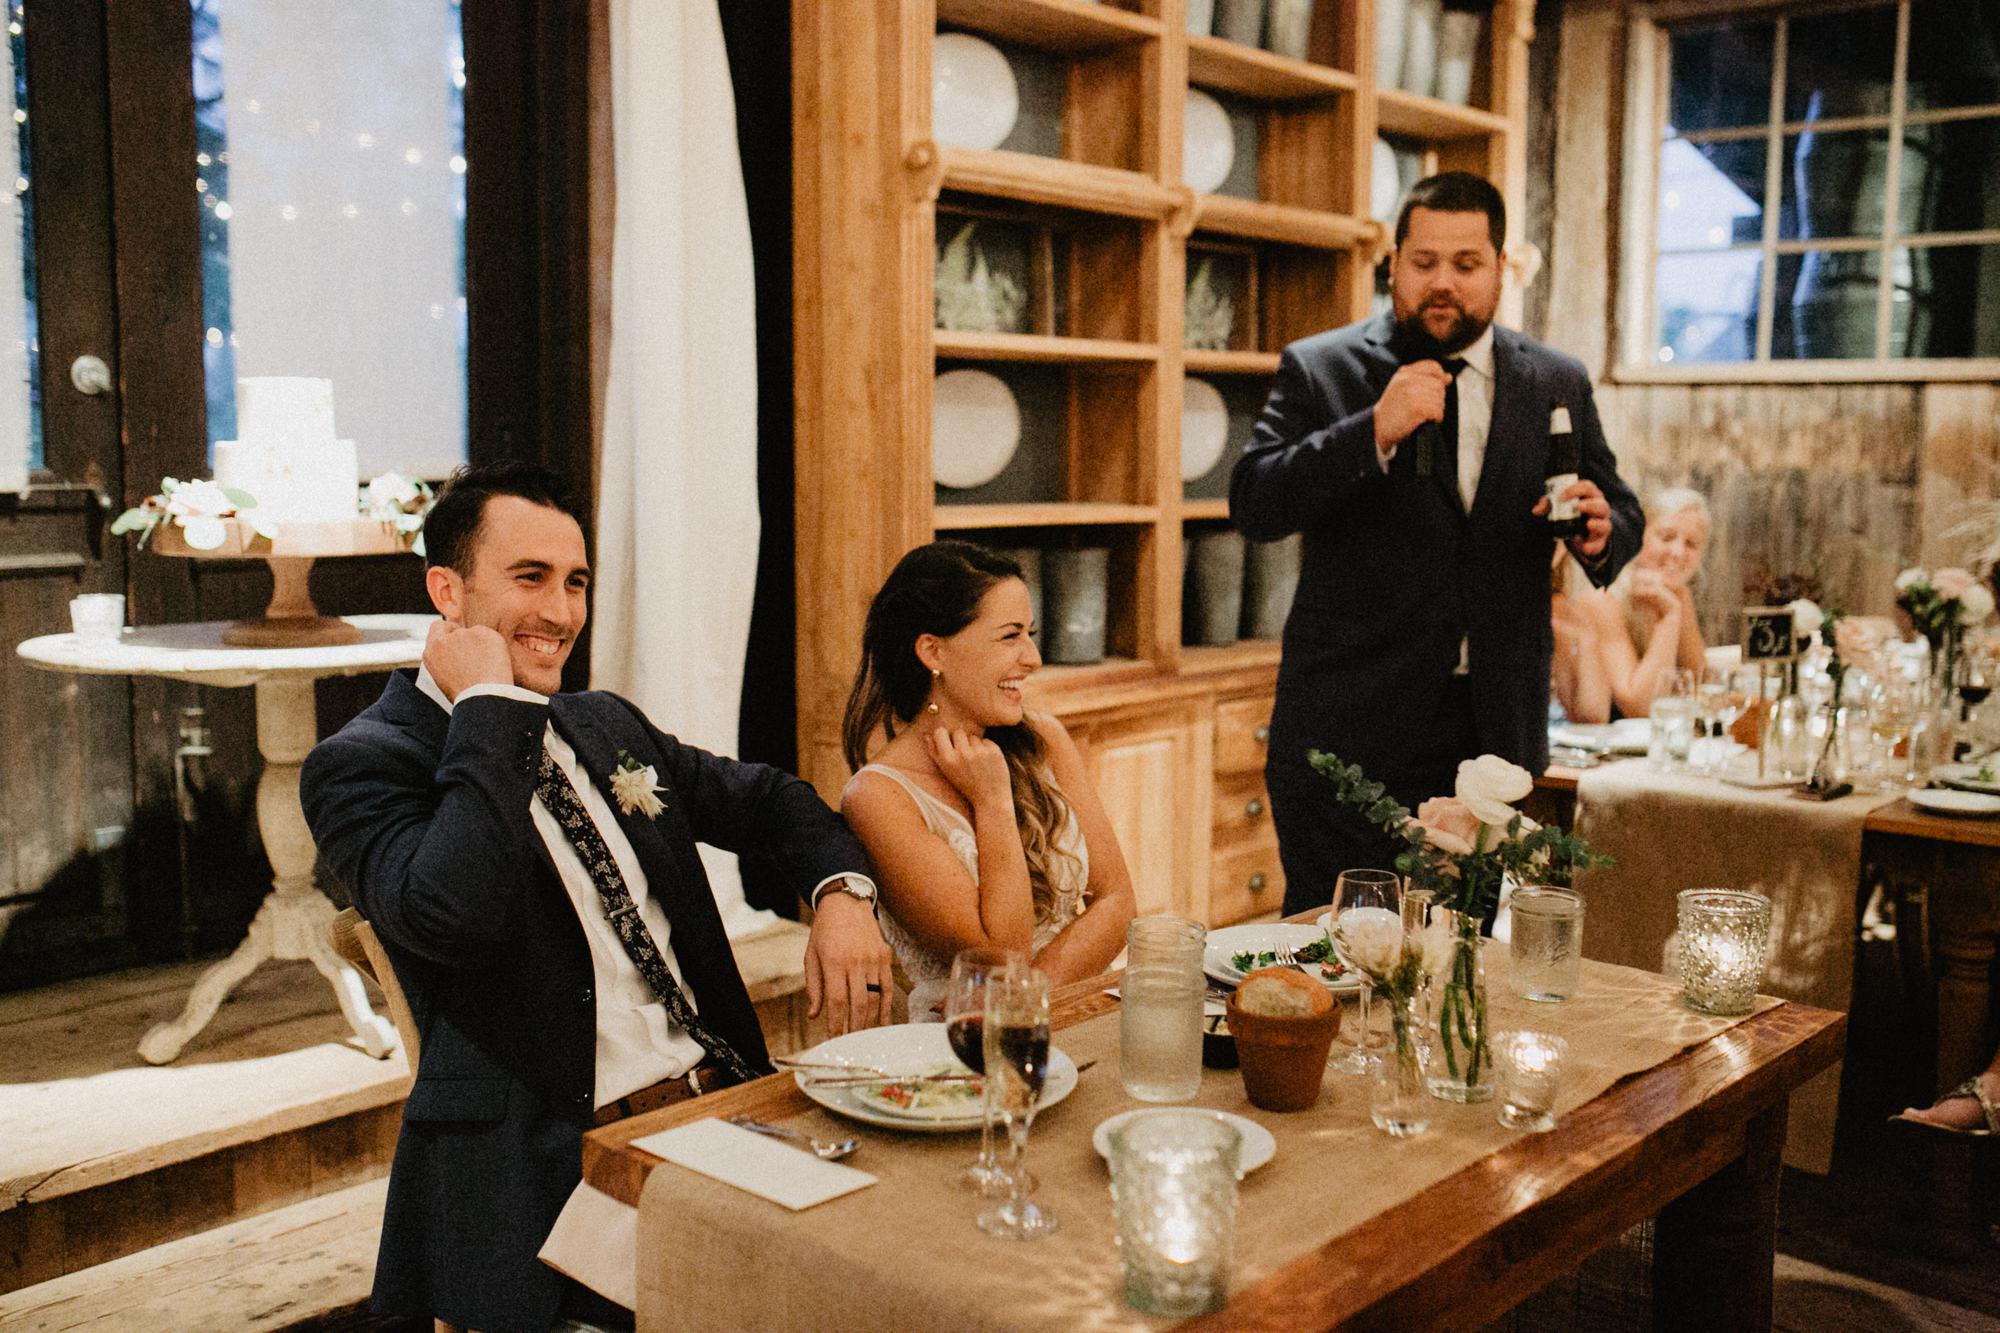 terrain-events-wedding-photographer-53.jpg